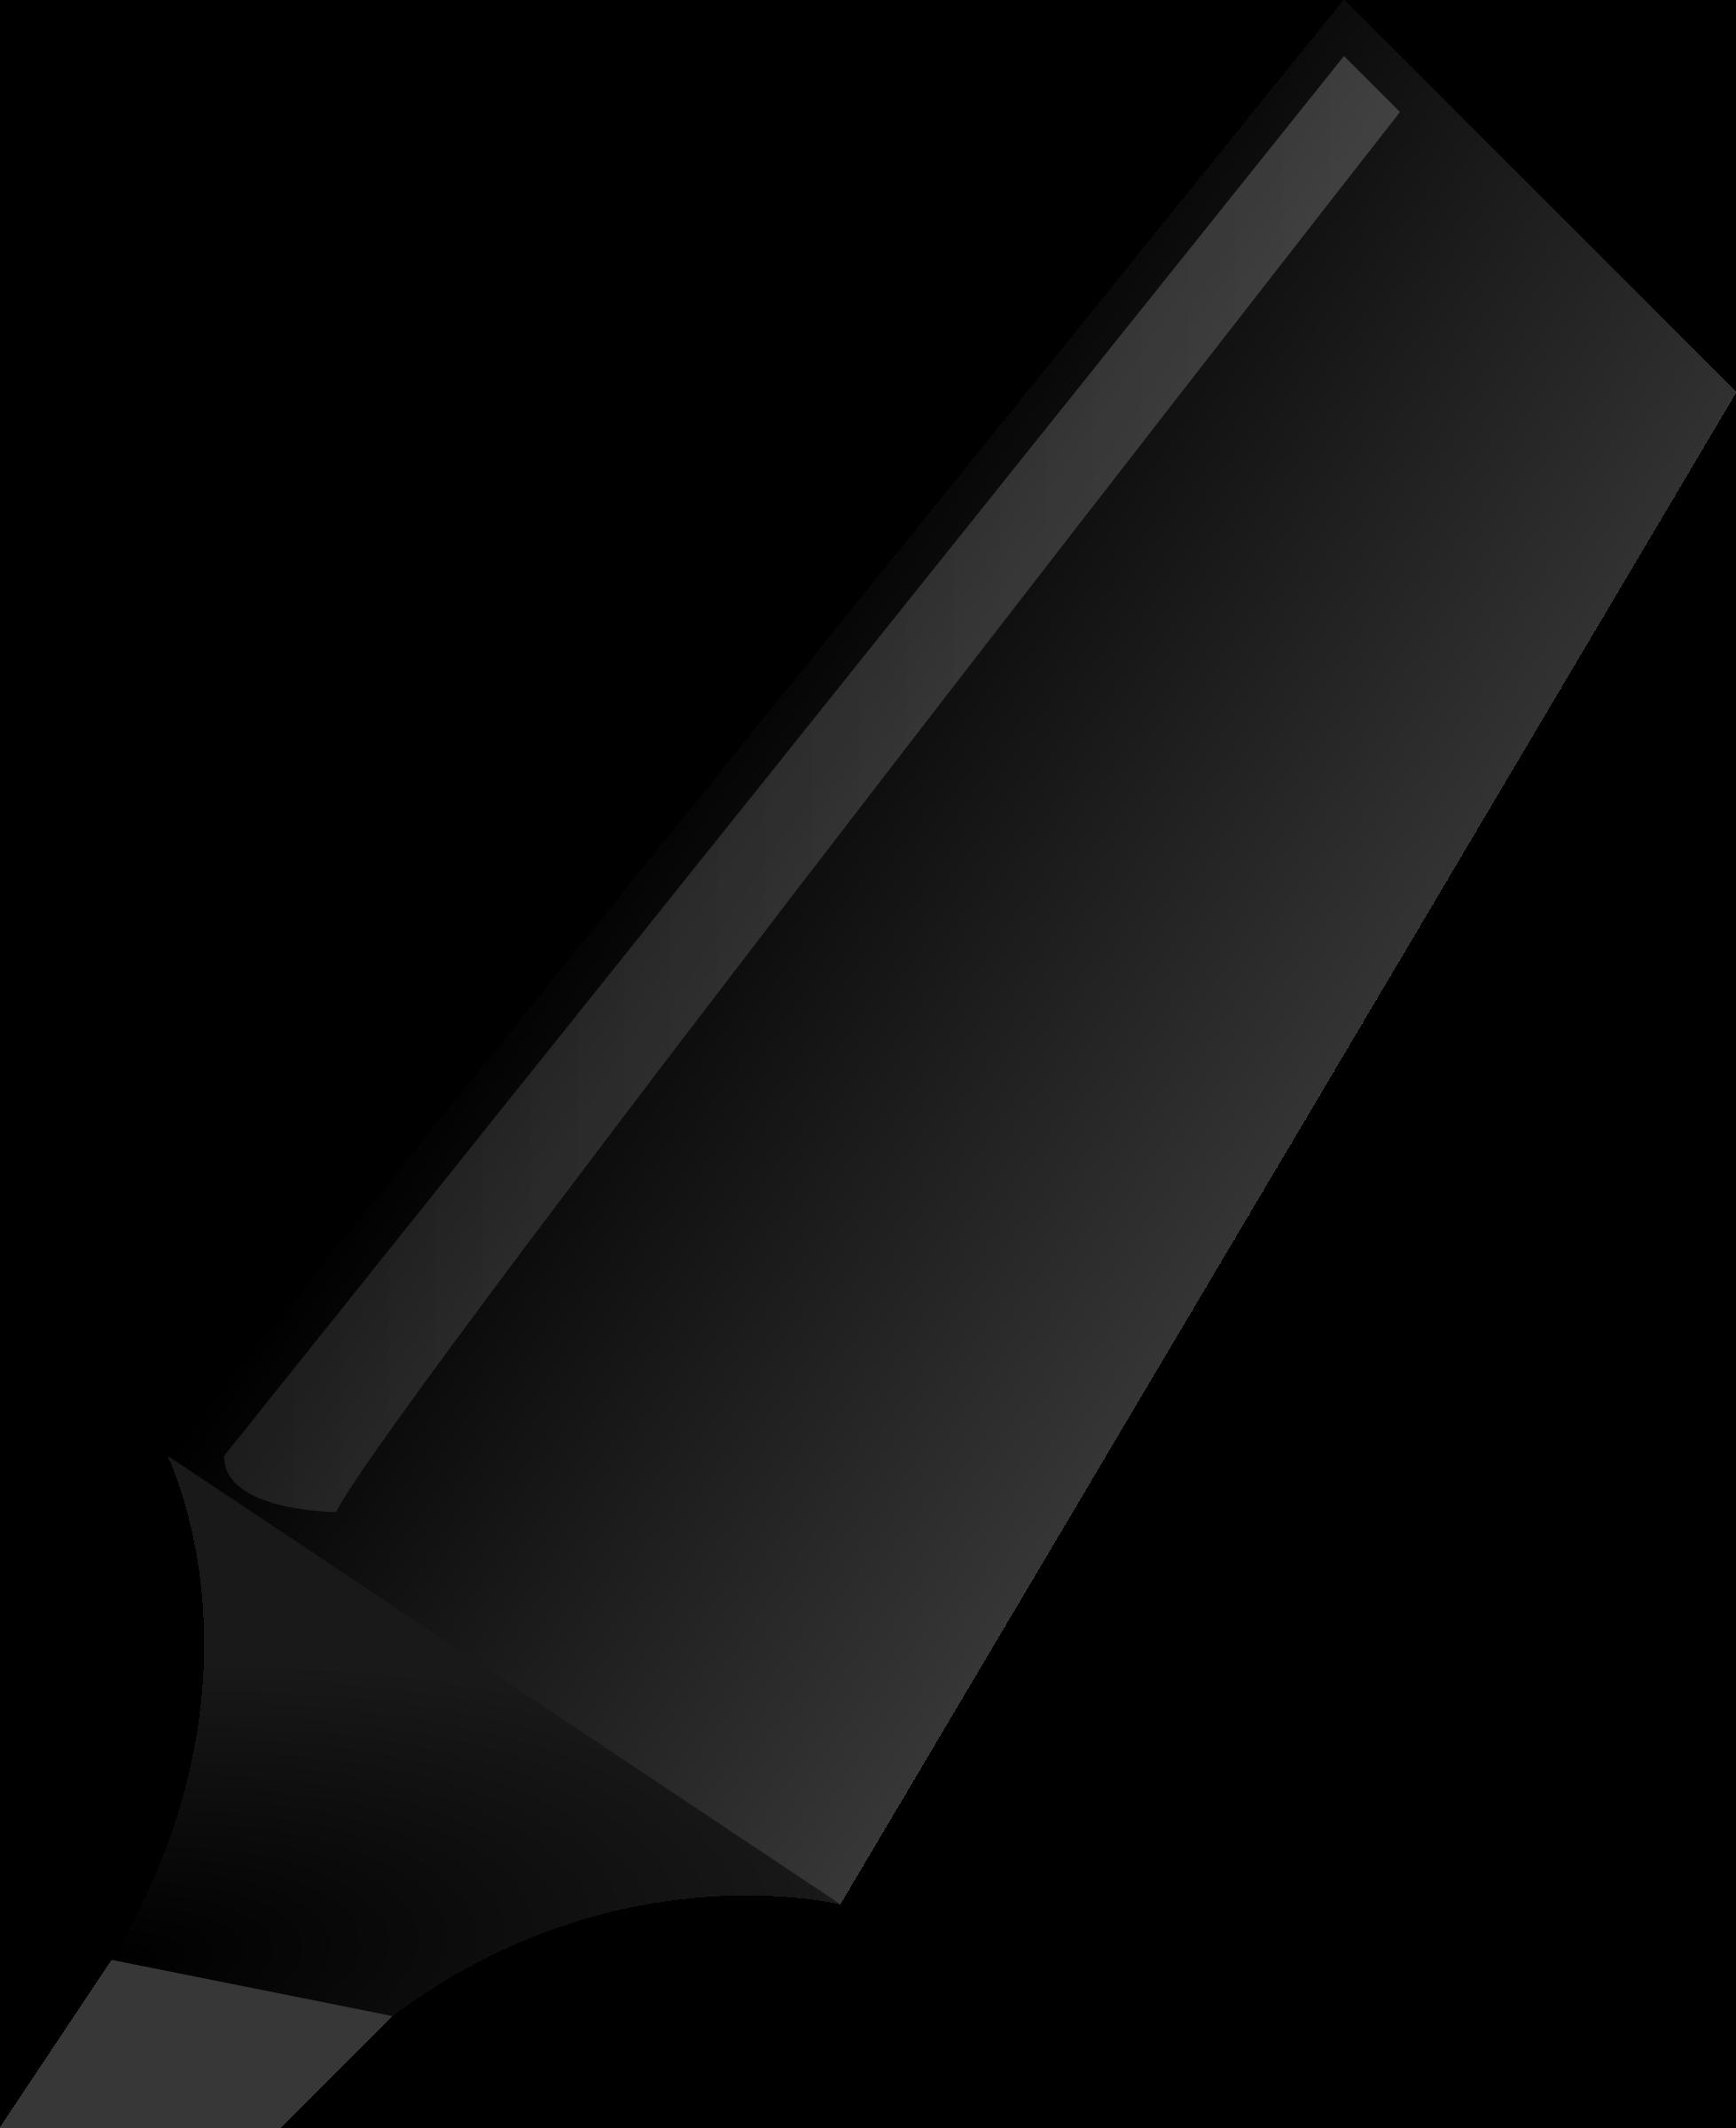 Markers clipart highlighter. Black big image png